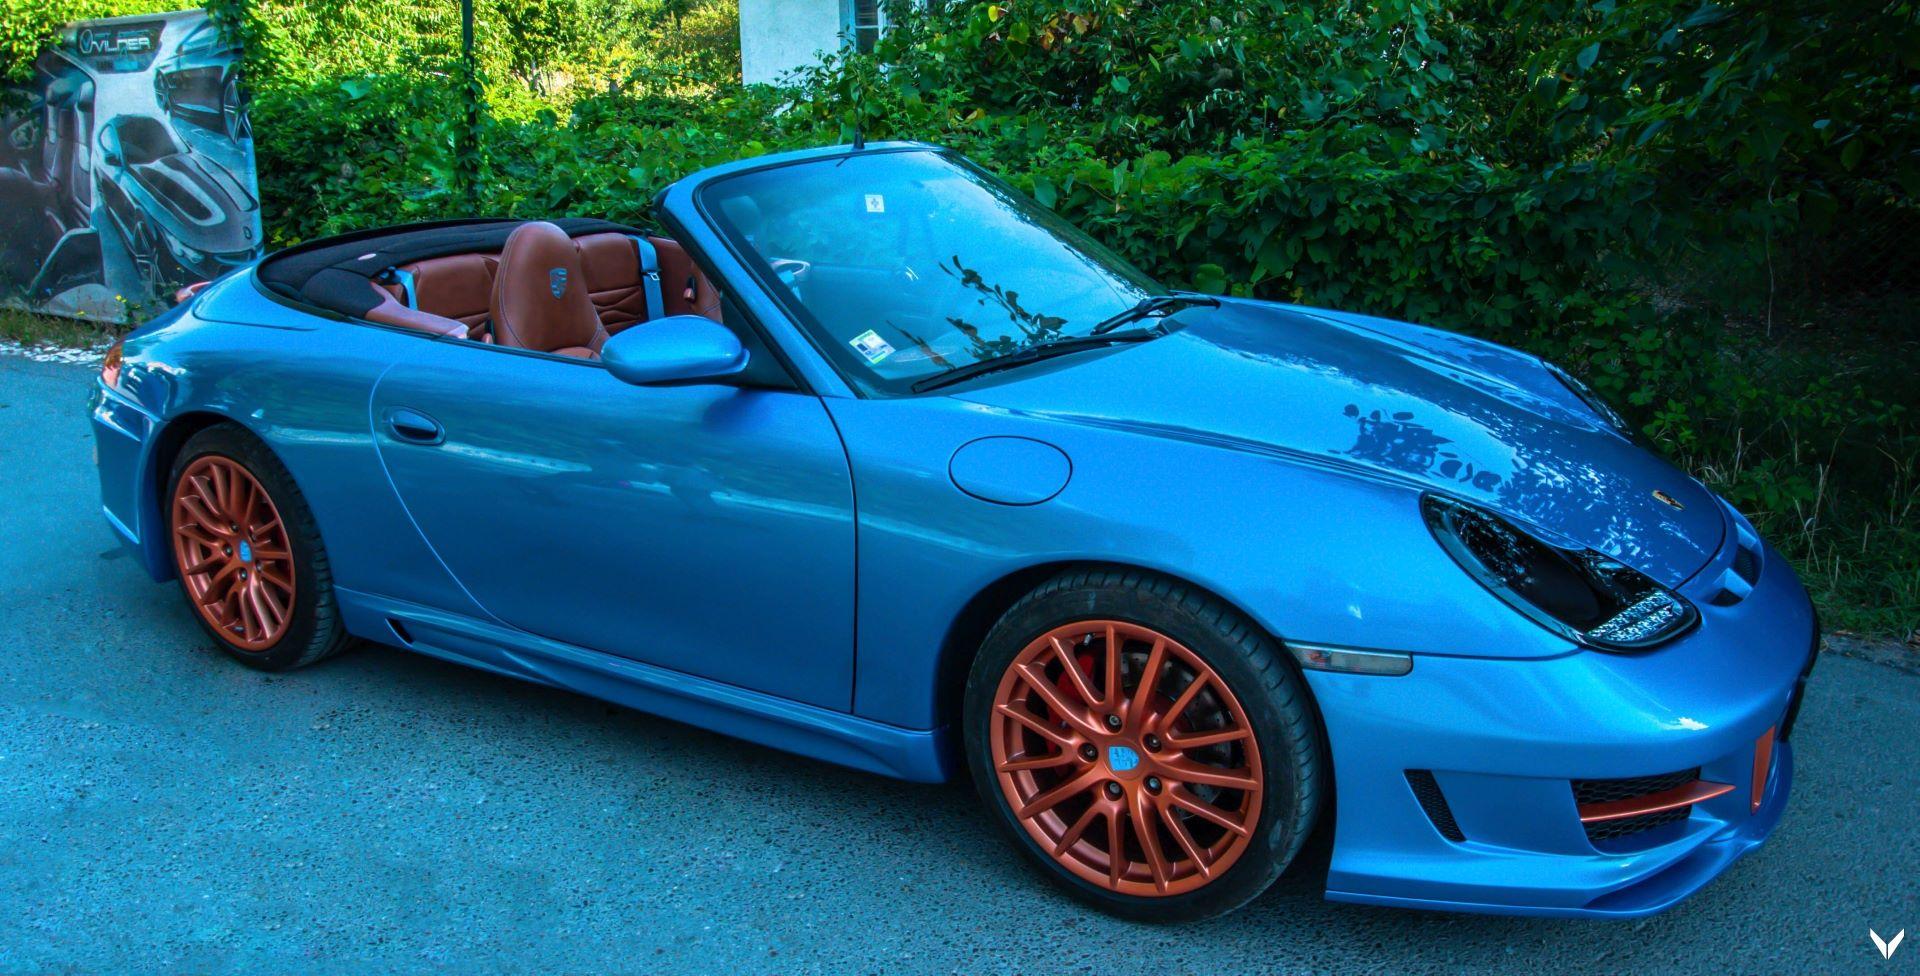 Porsche-911-Cabriolet-by-Vilner-40